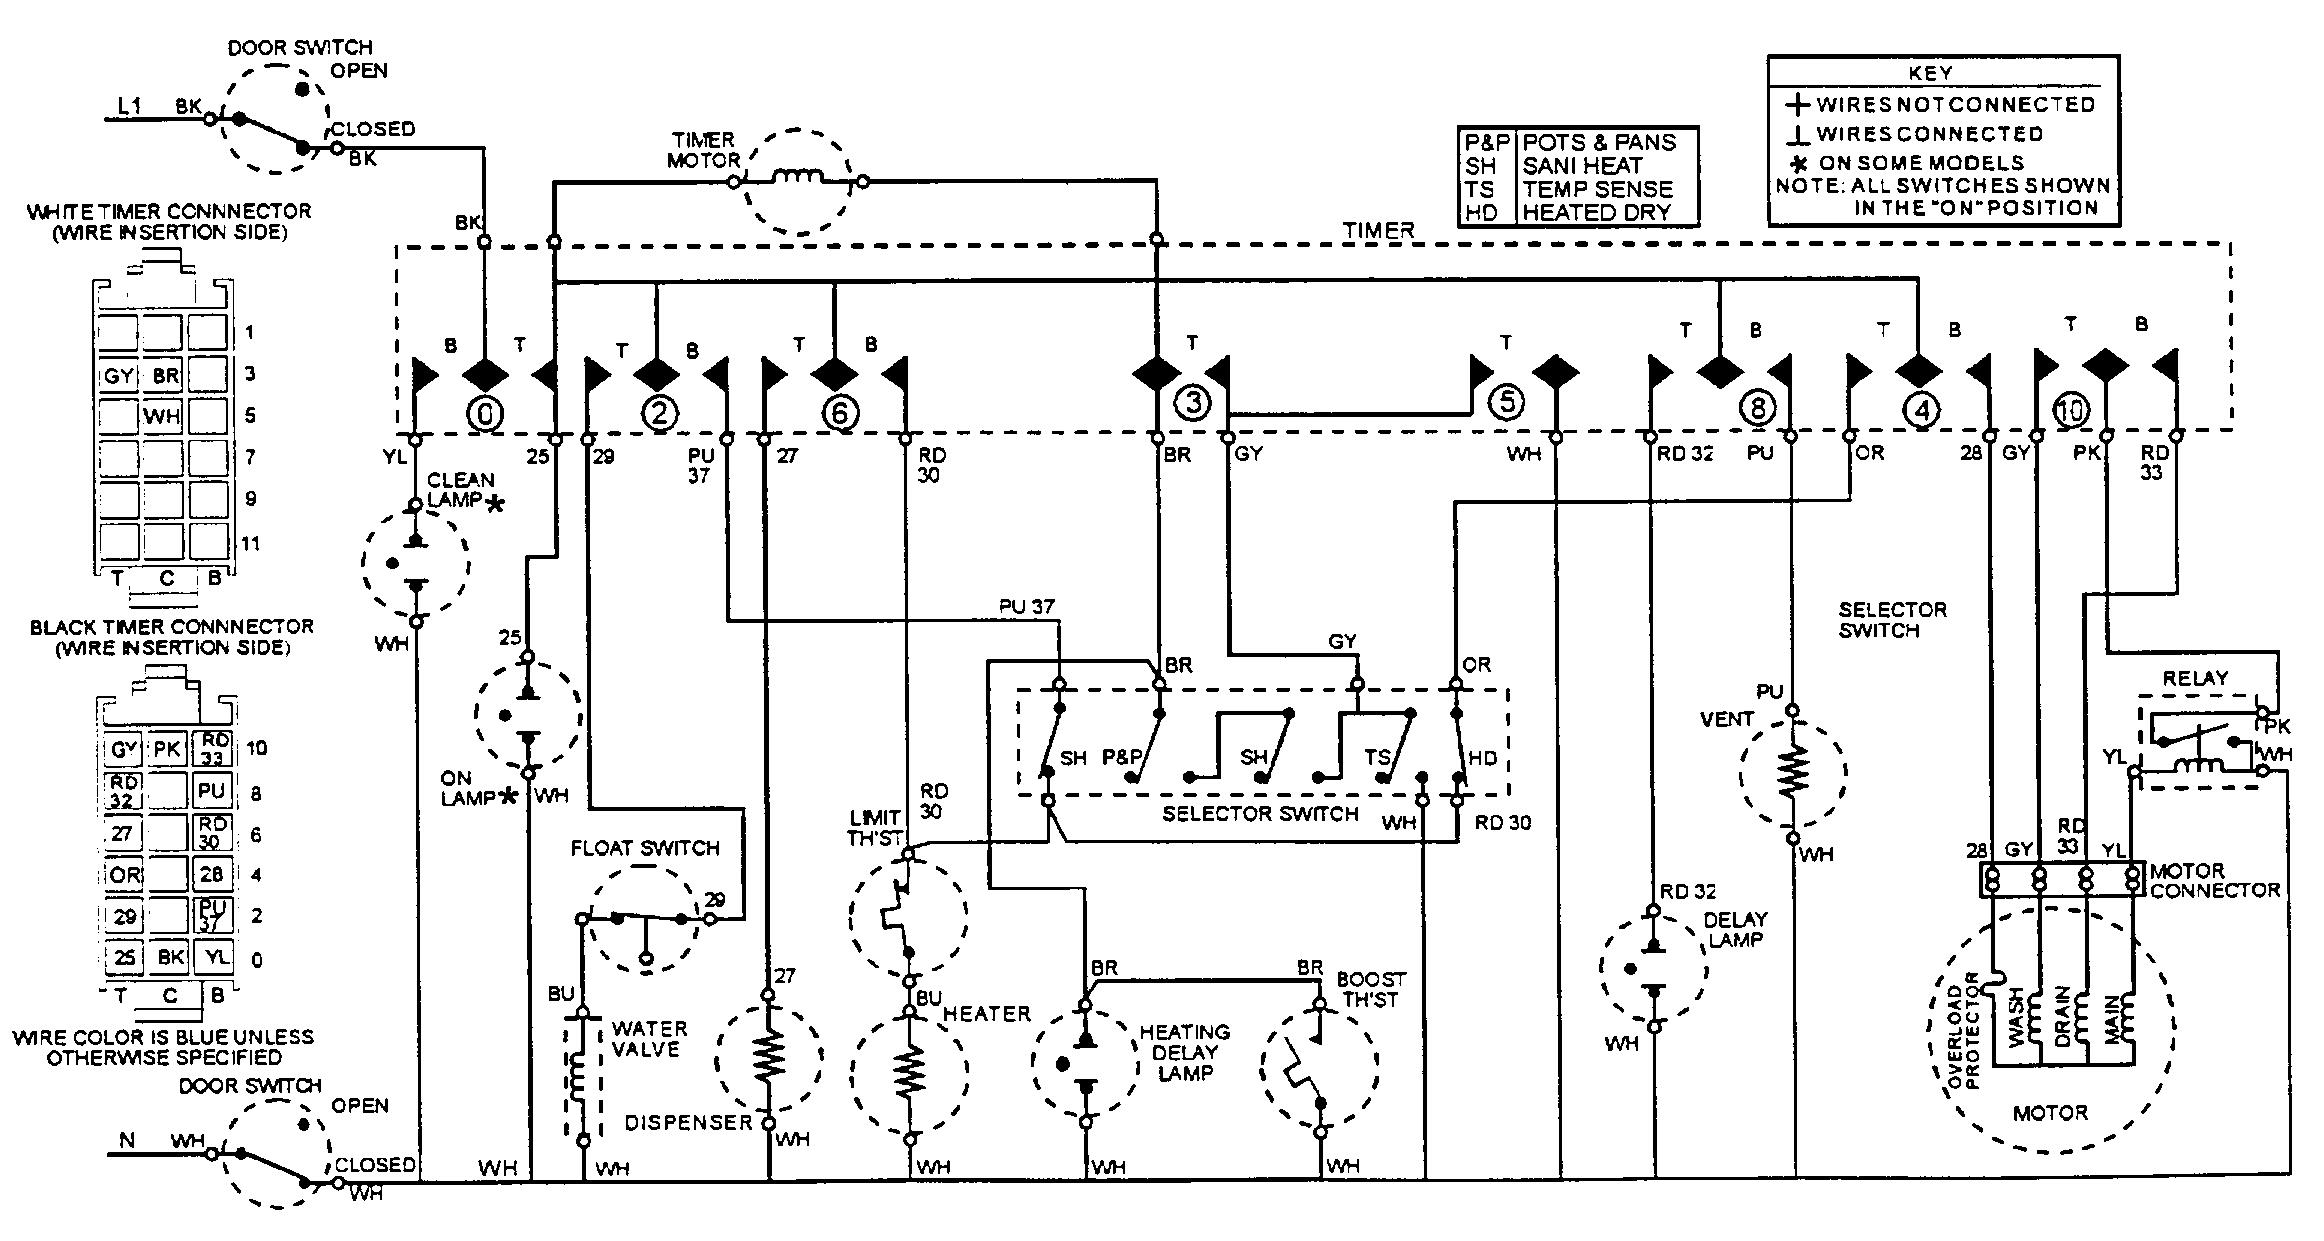 Maytag model MDC4000AWX dishwasher genuine parts